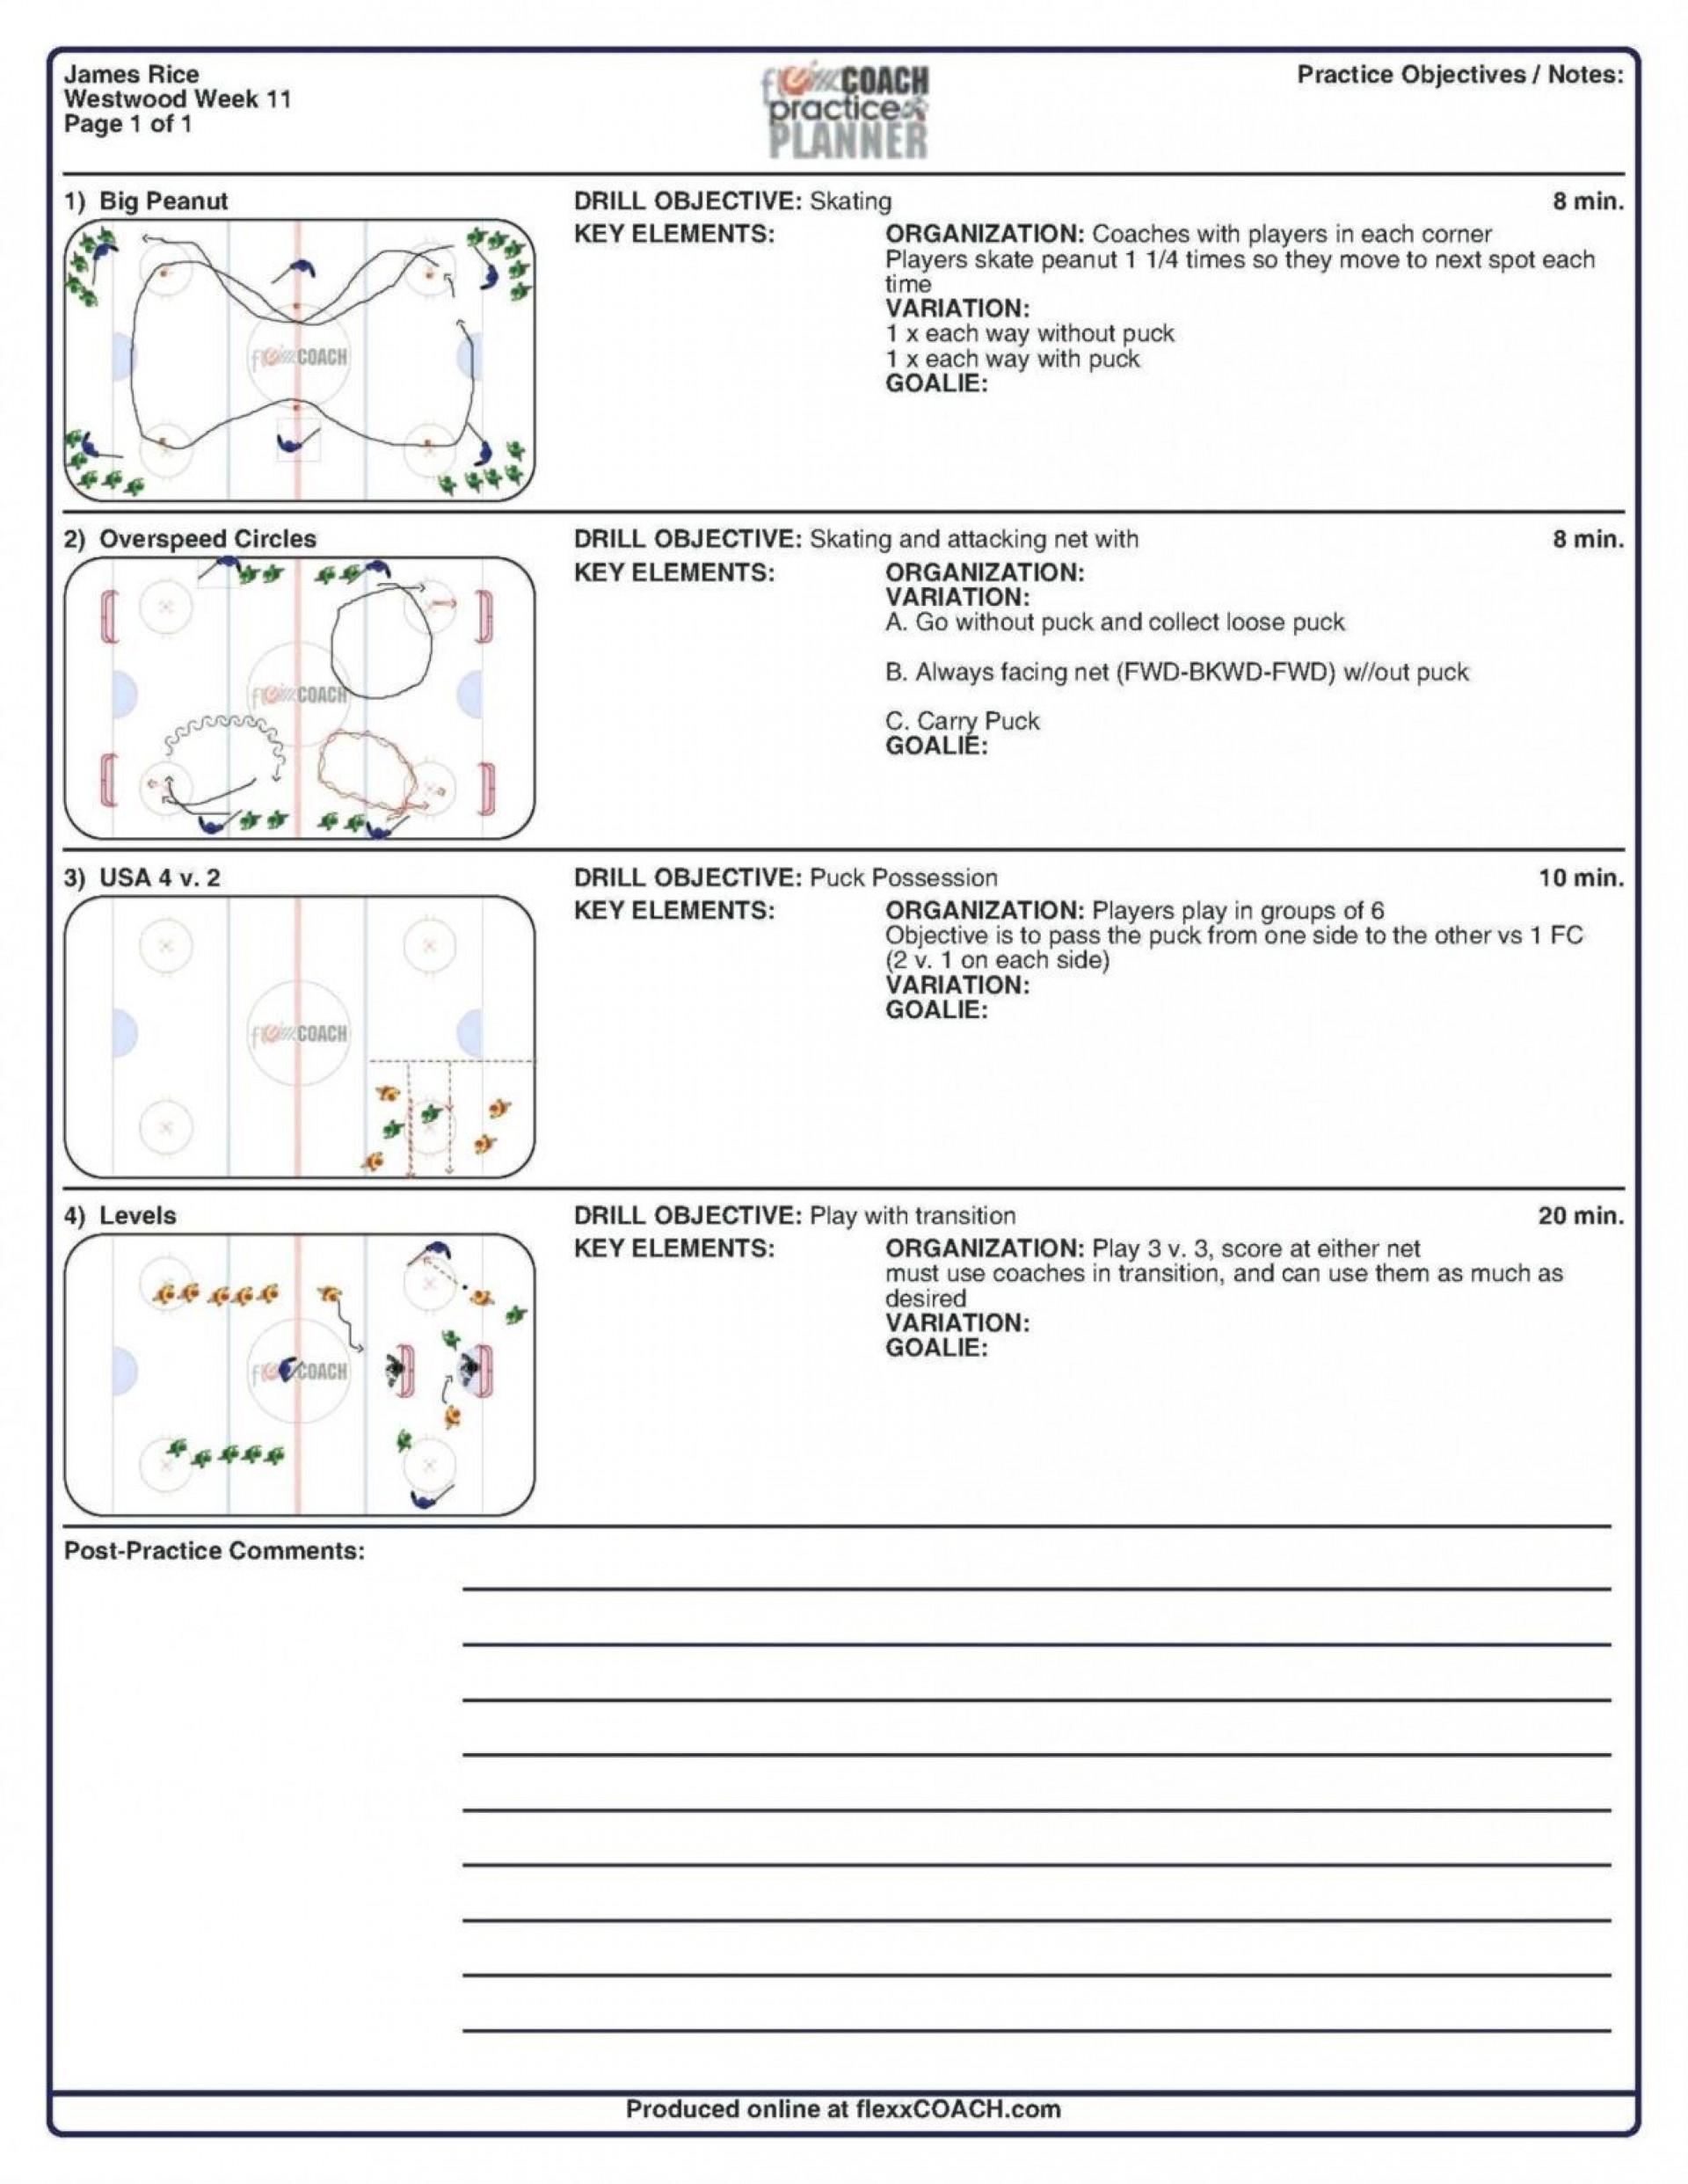 006 Dreaded Basketball Practice Plan Template High Def  Doc Pdf Free Printable1920